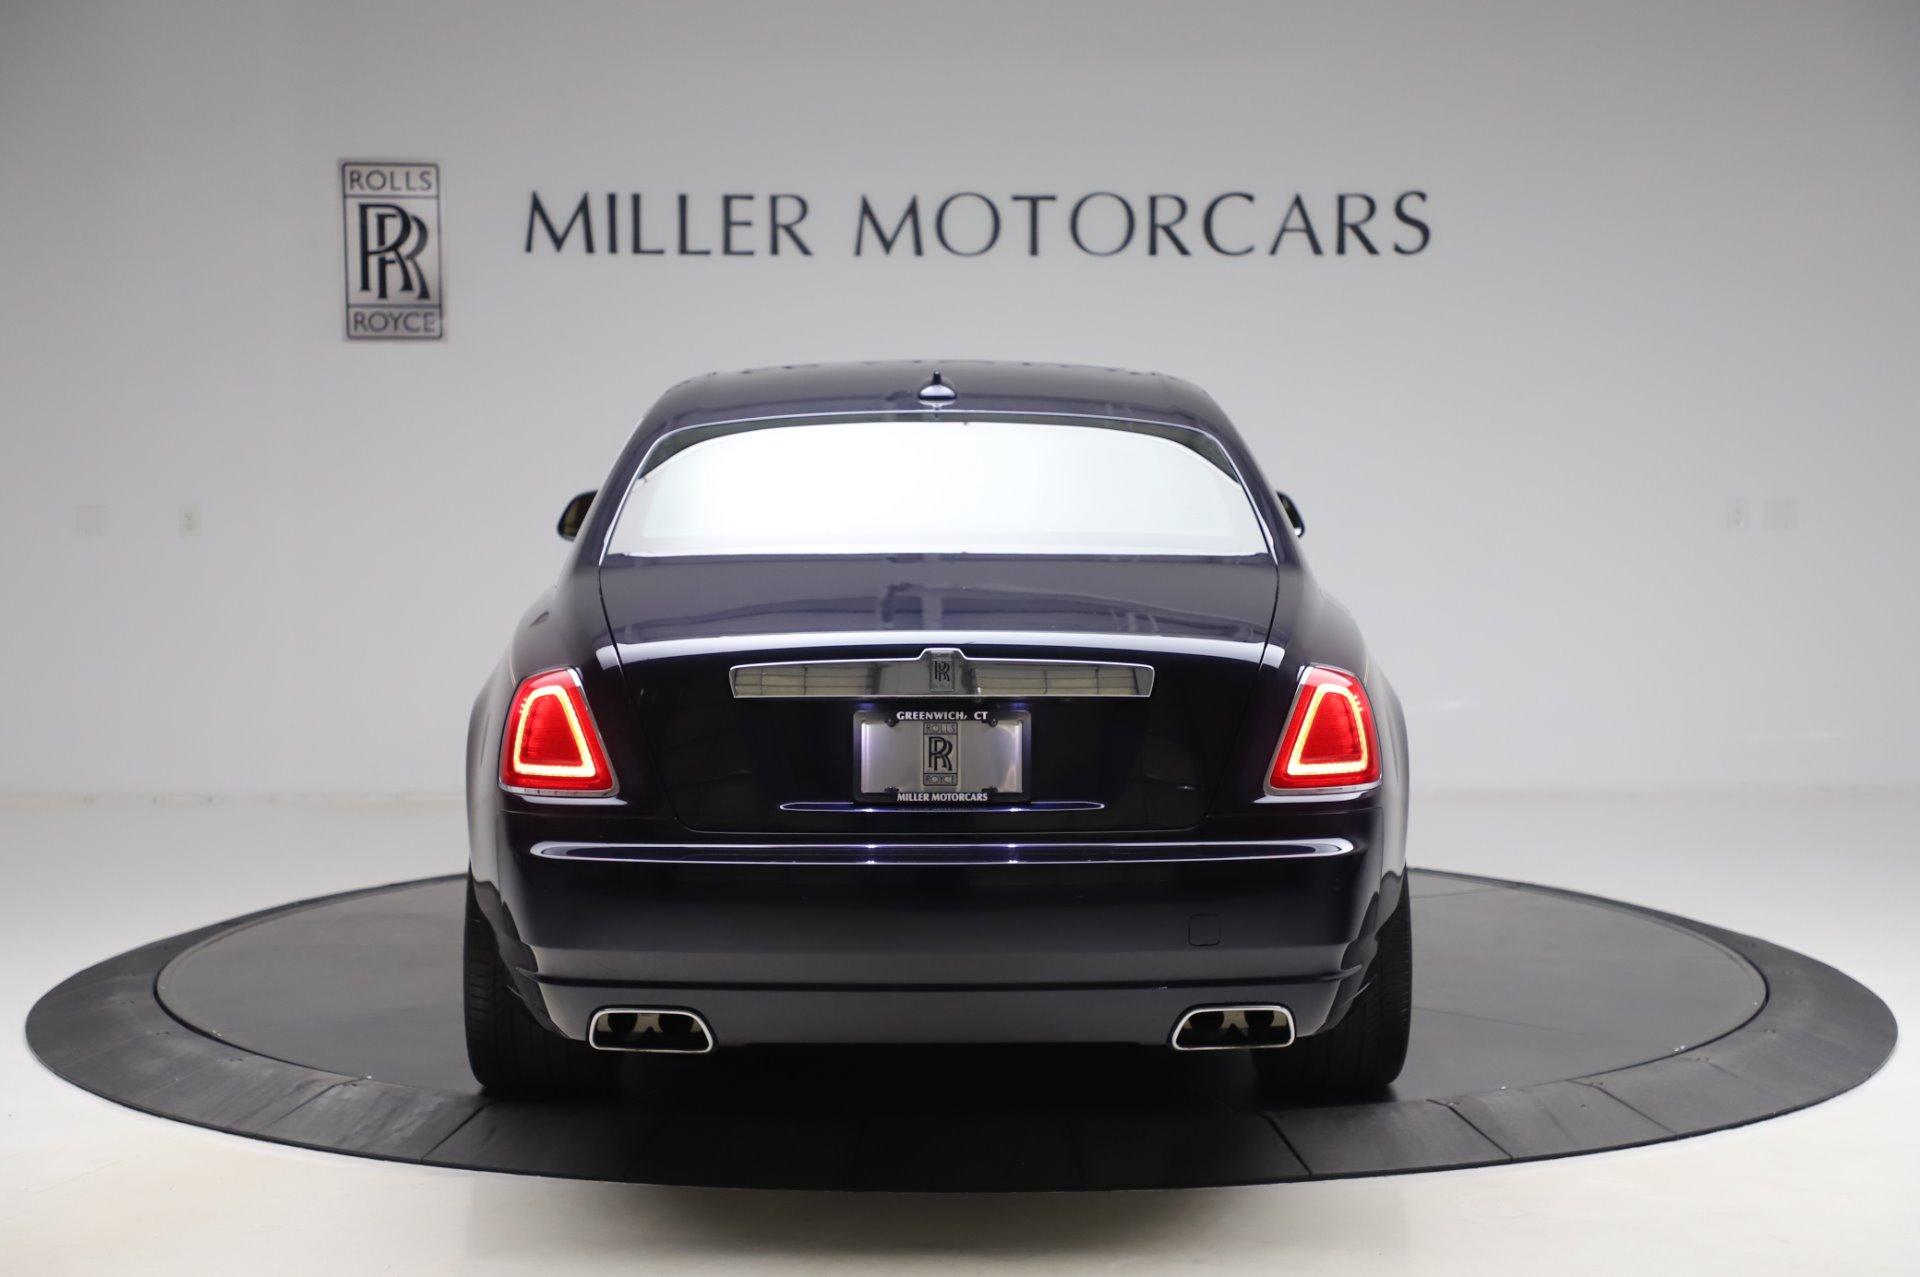 Used 2014 Rolls-Royce Ghost V-Spec For Sale In Westport, CT 858_p5